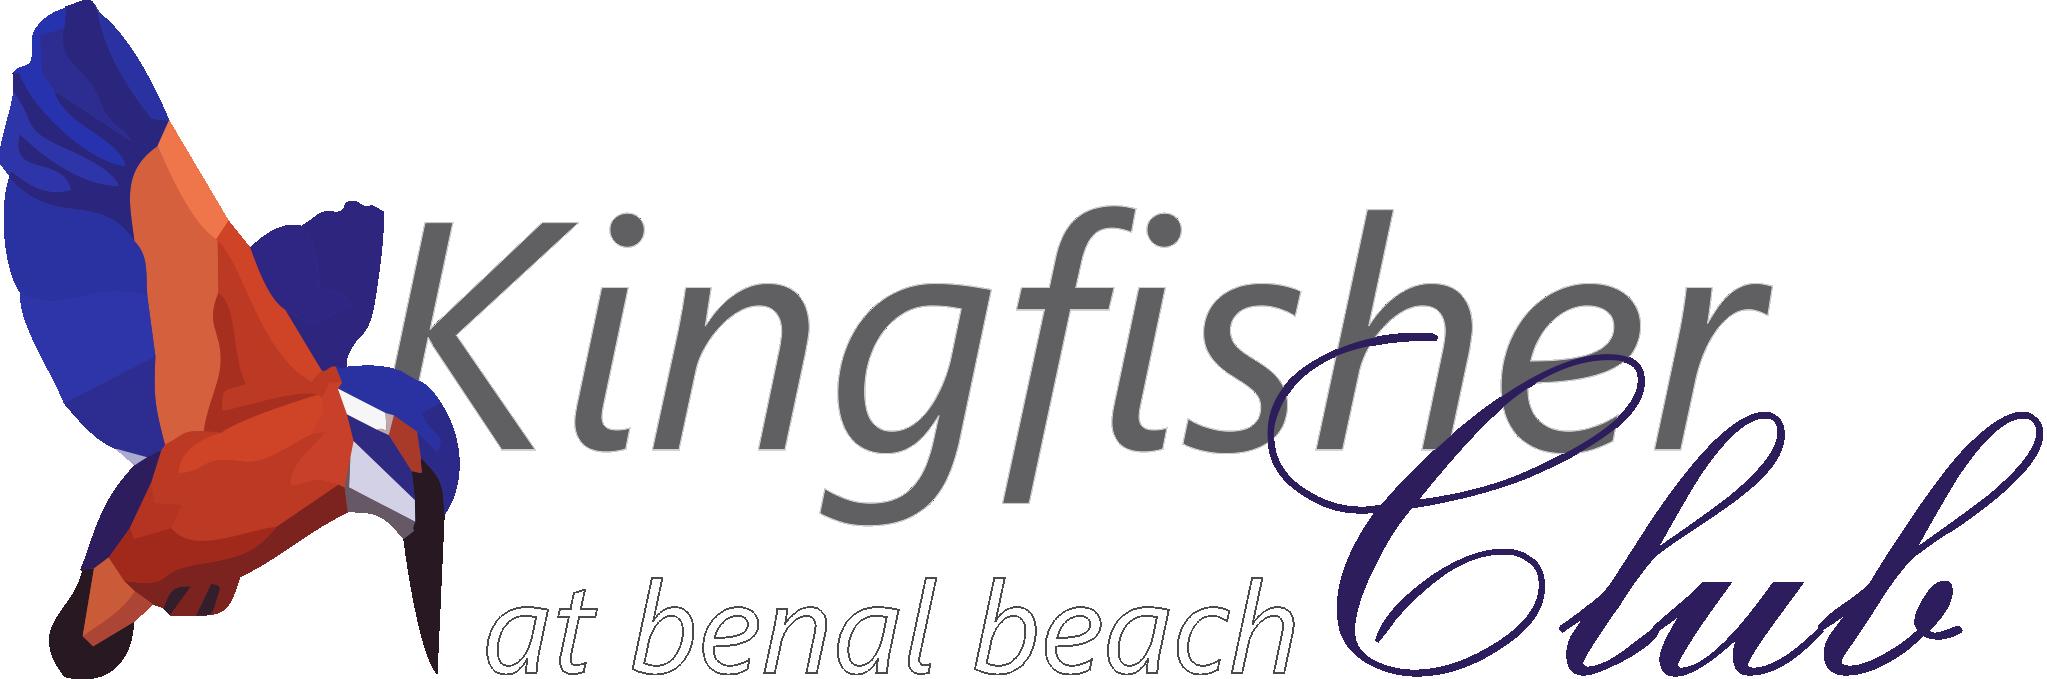 The Kingfisher Club Benal Beach - Benalmádena - Spain